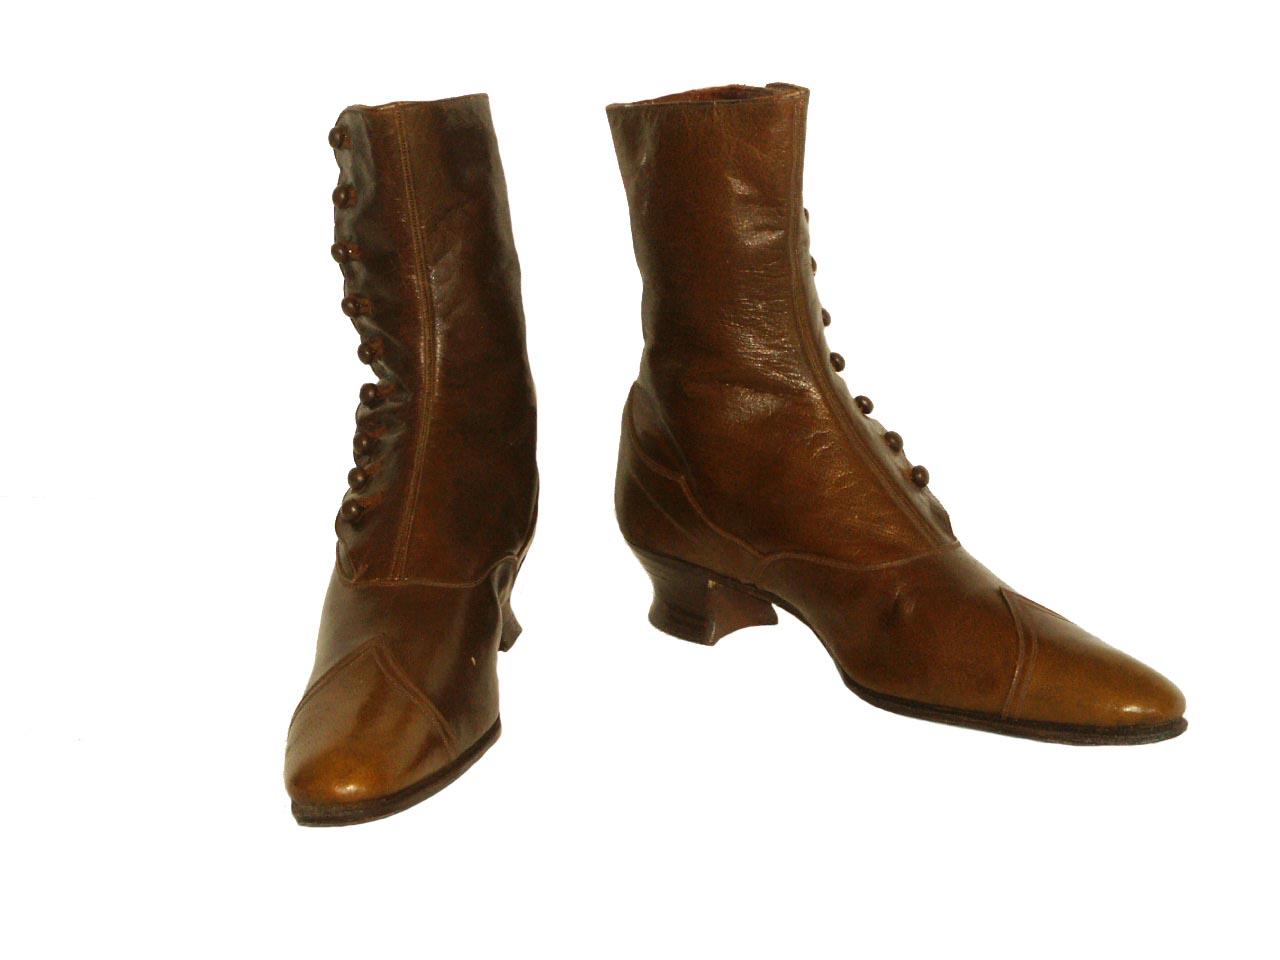 Chaussure Un regard Certain année 1900 1914 Yvbf76gy